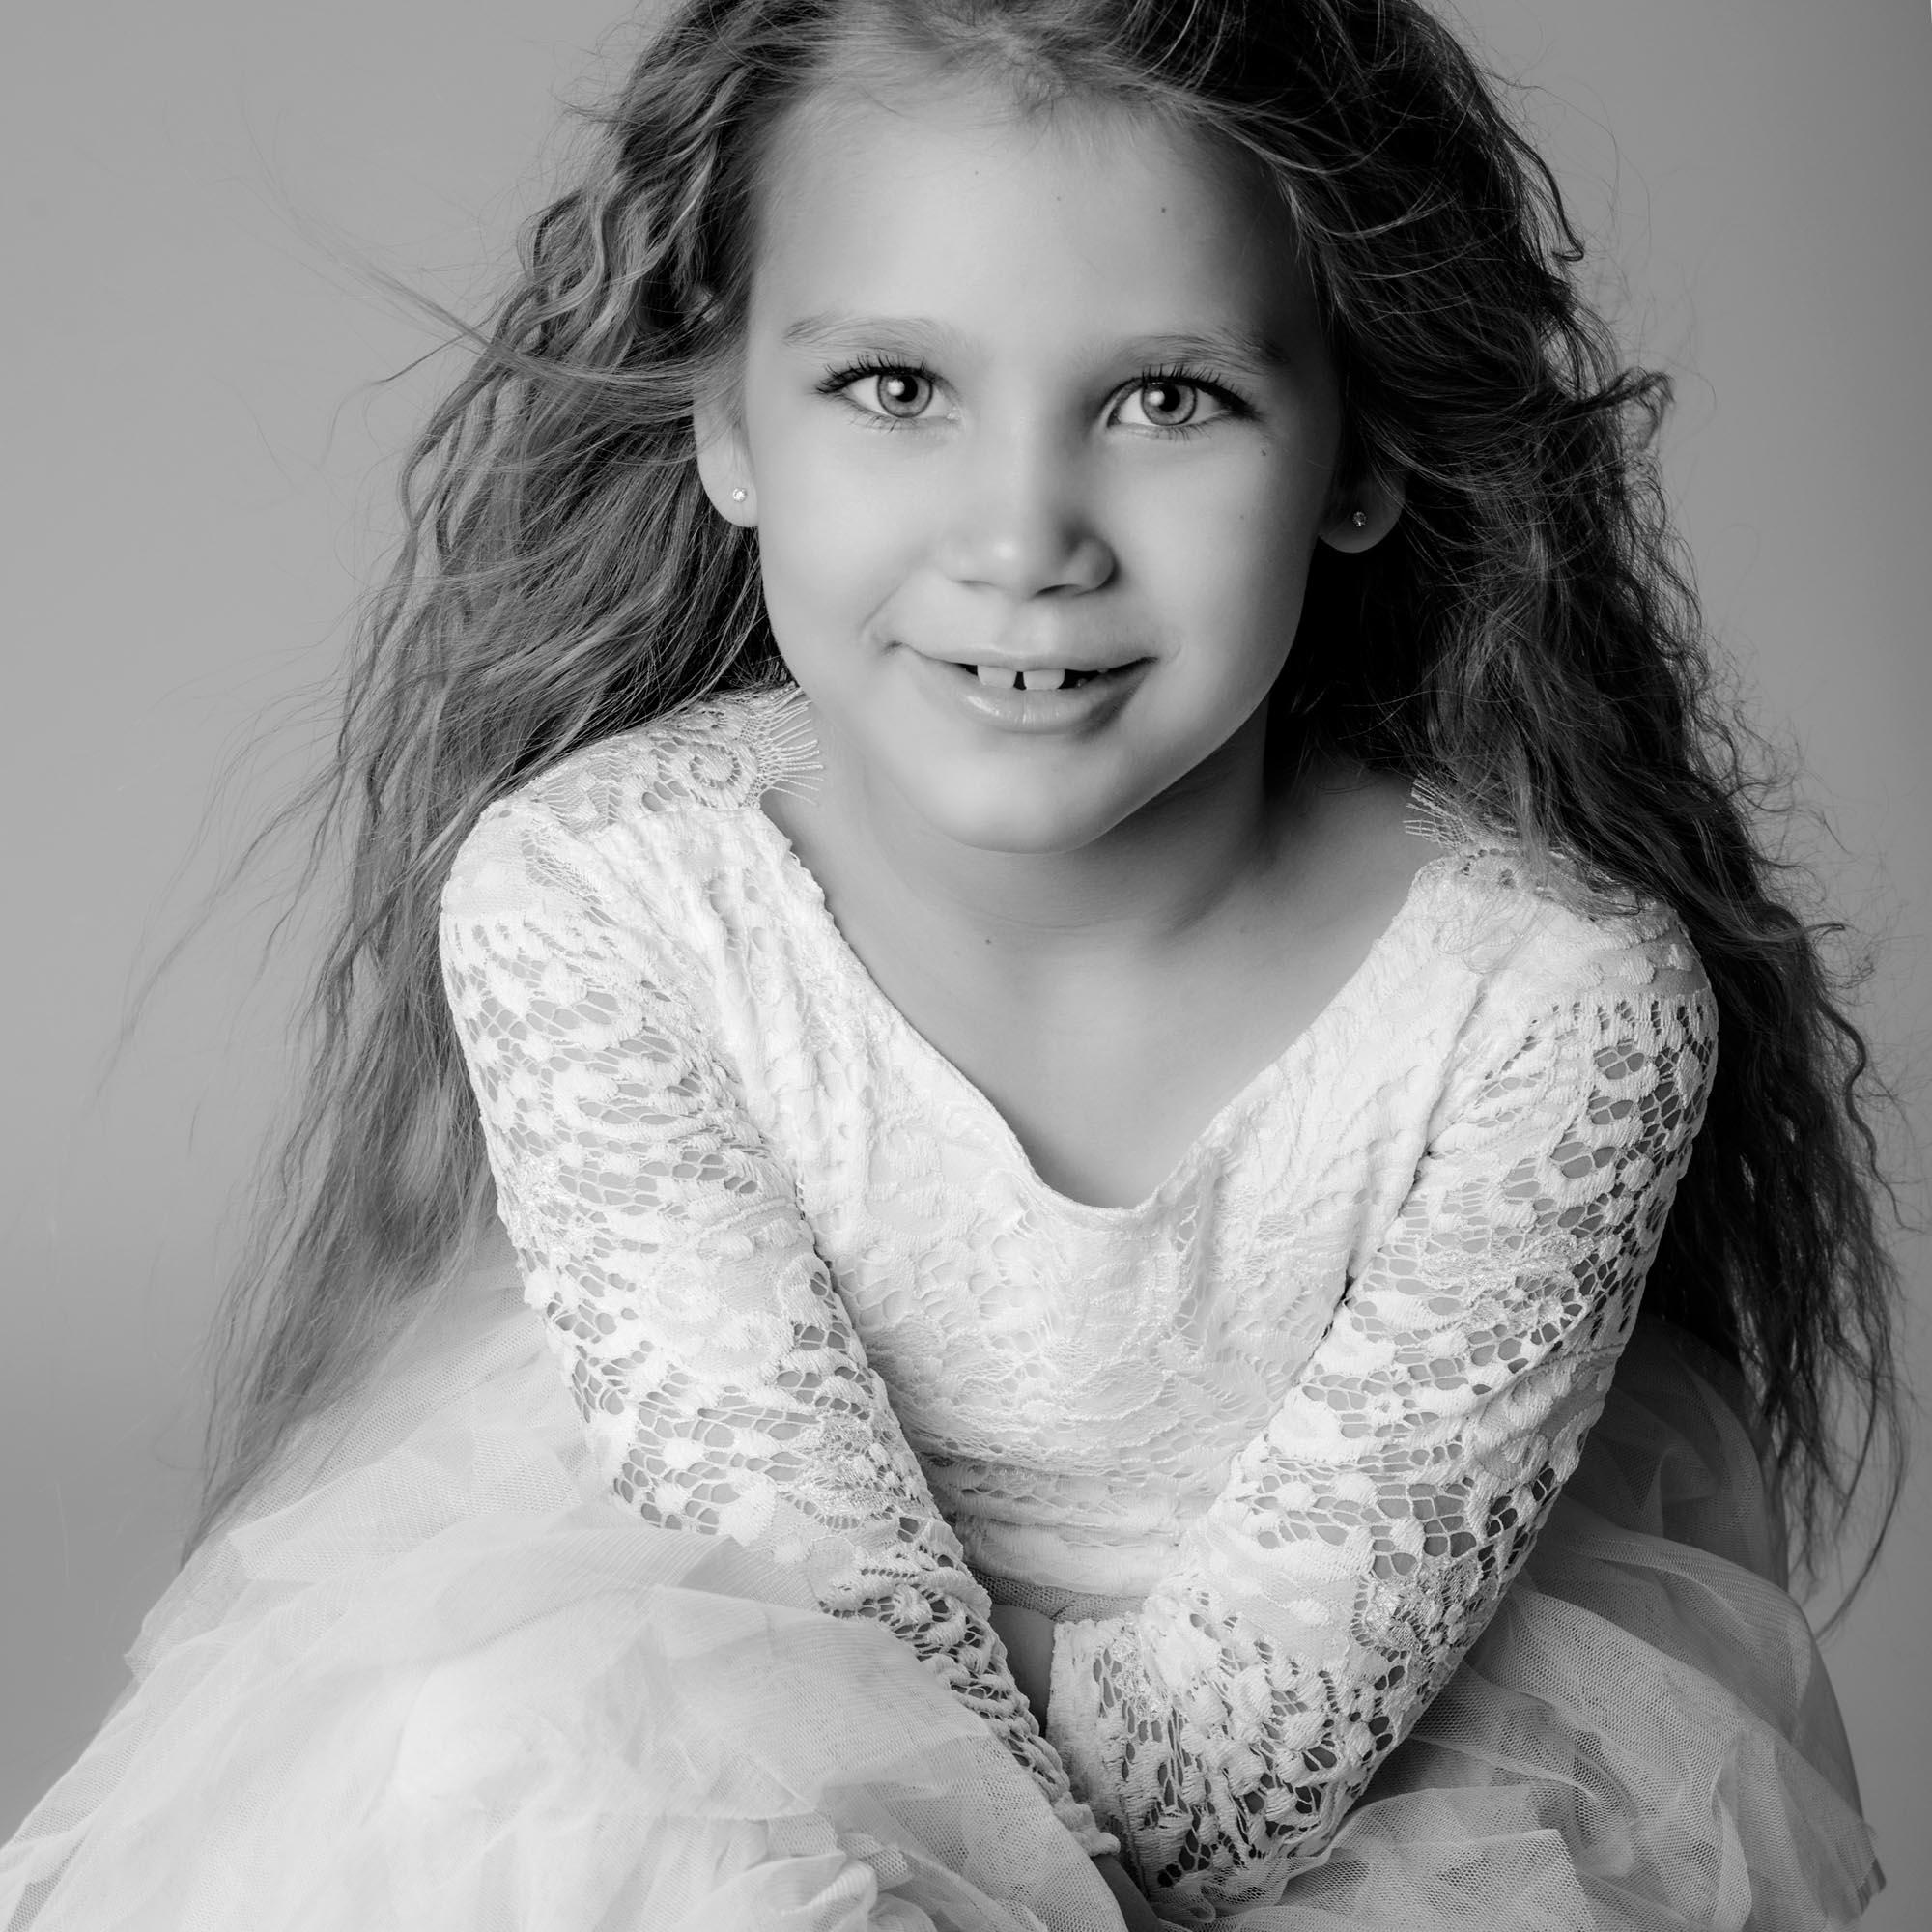 nyc-photographers-kids-modeling-10023.jpg